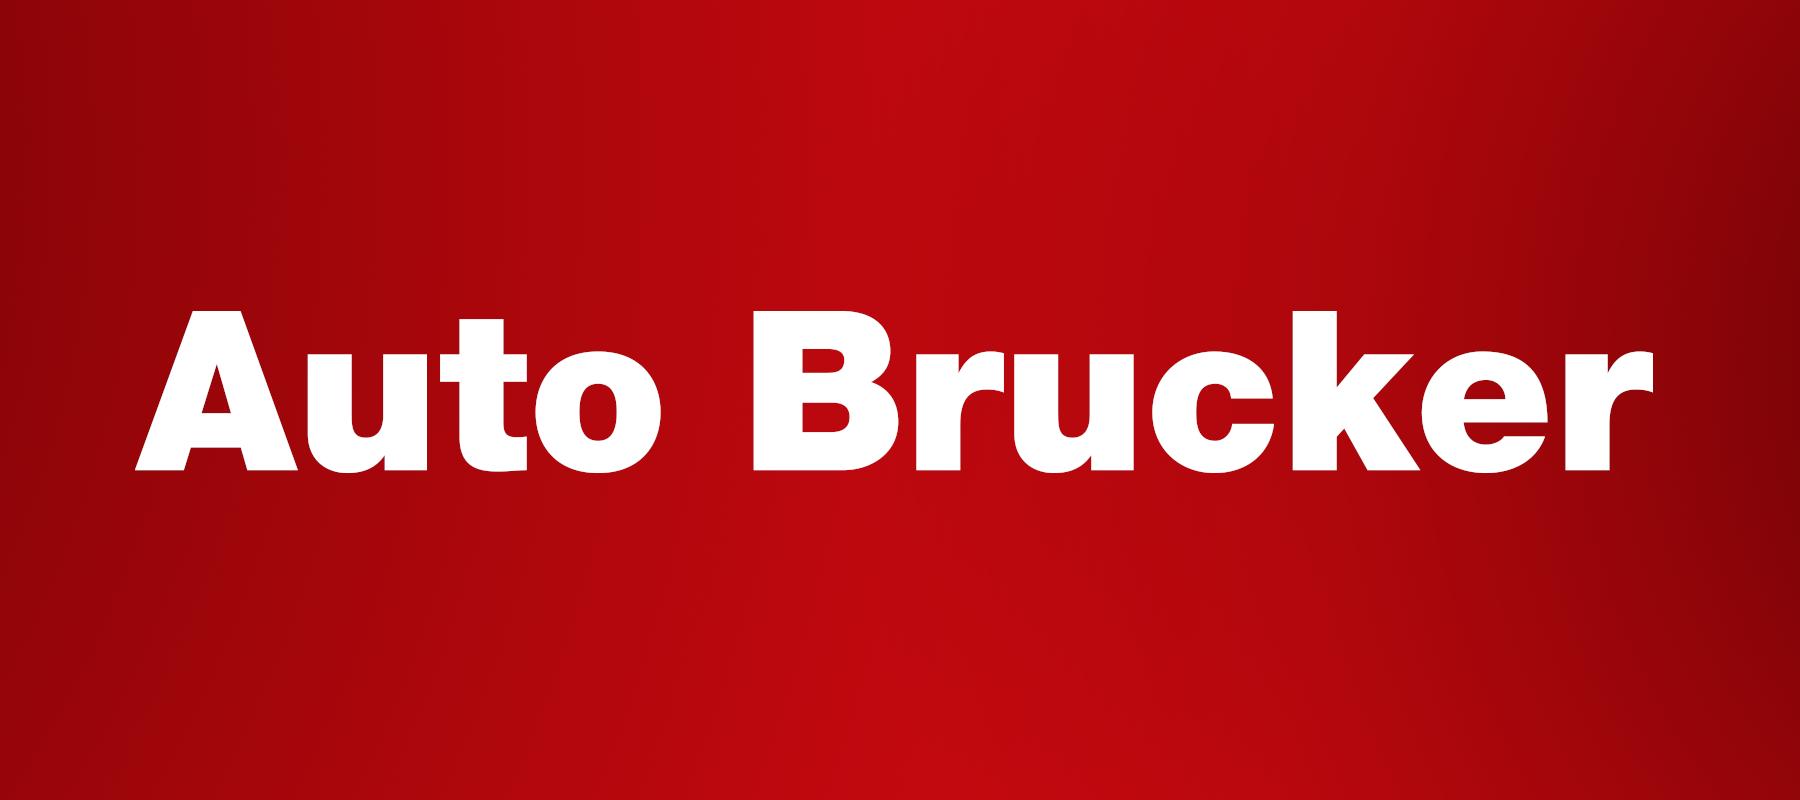 Auto Brucker